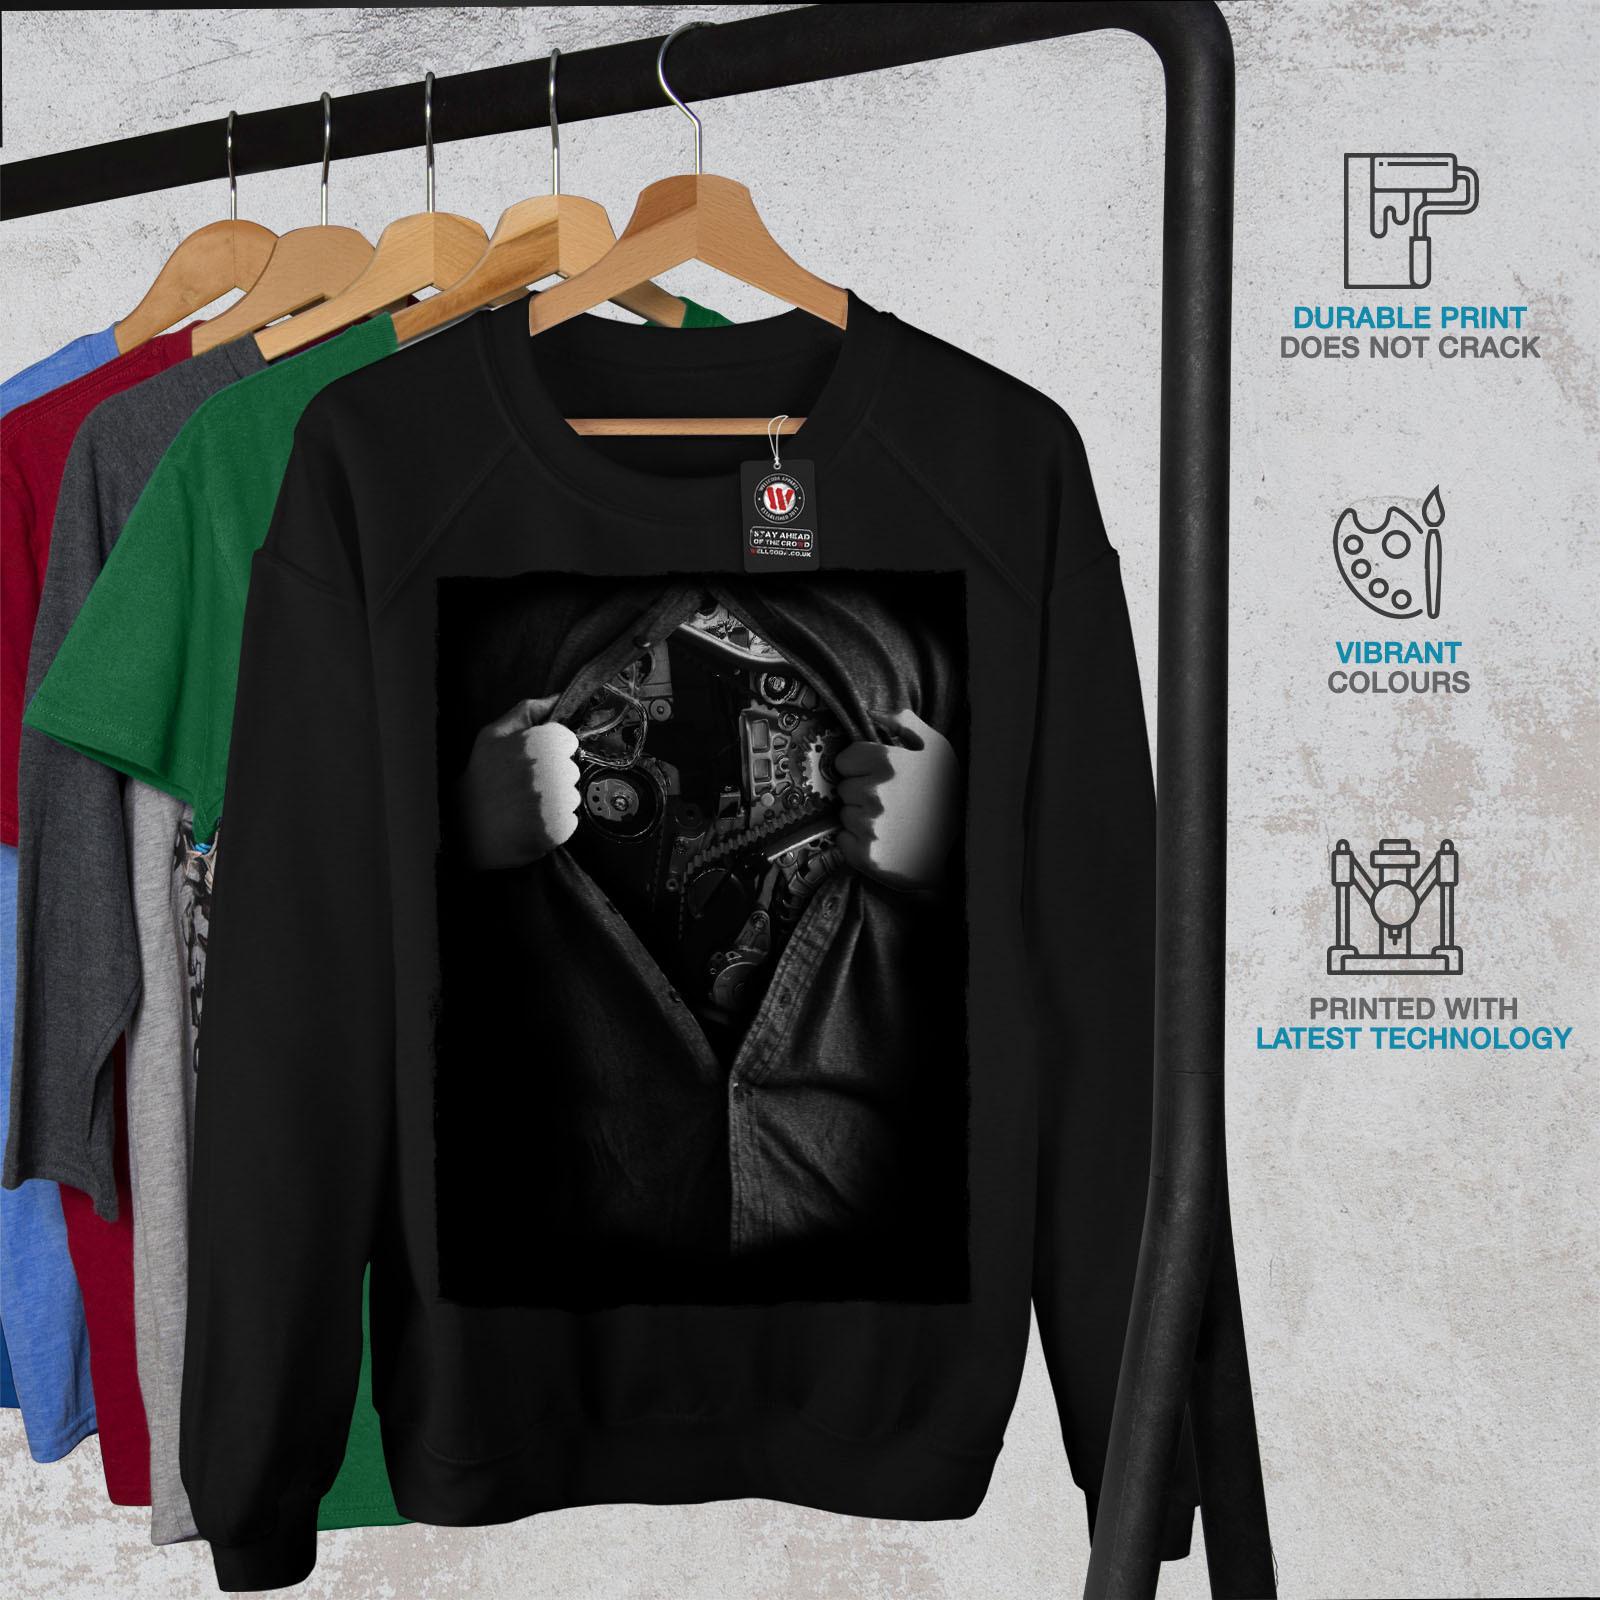 wellcoda Dream Urban Photo Mens Sweatshirt Urban Casual Jumper